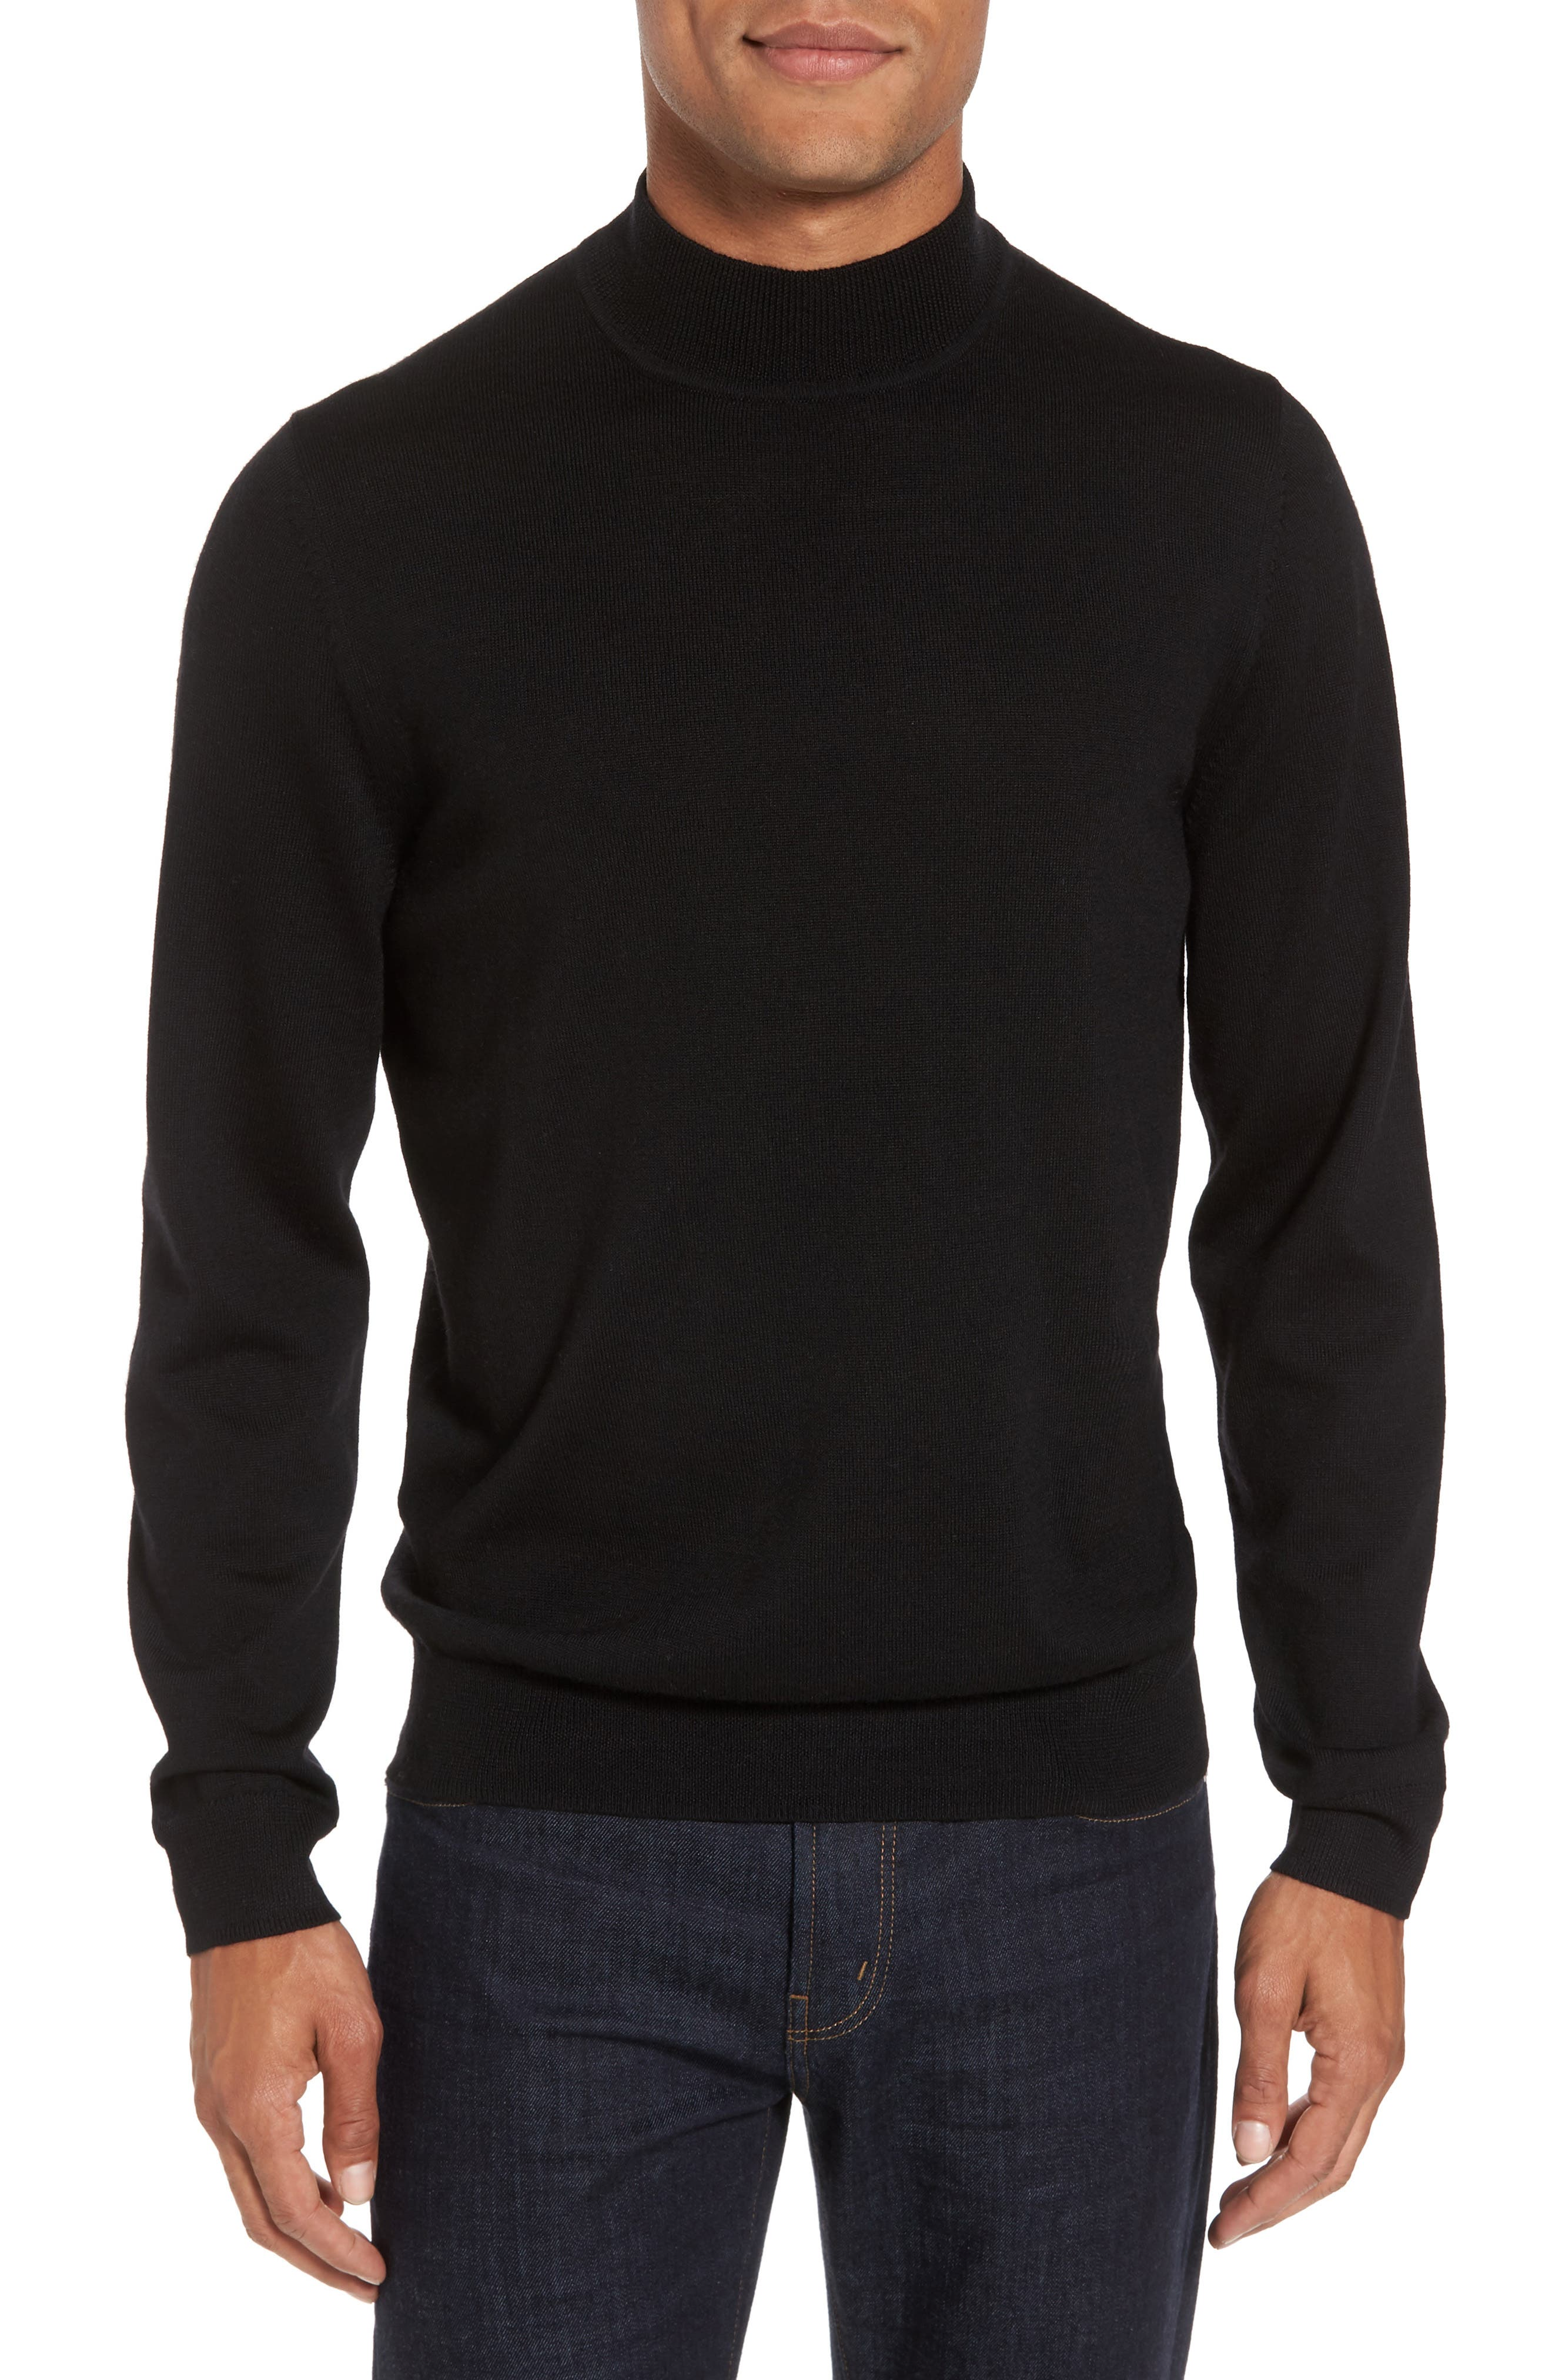 Nordstrom Shop Mock Neck Merino Wool Sweater, Black